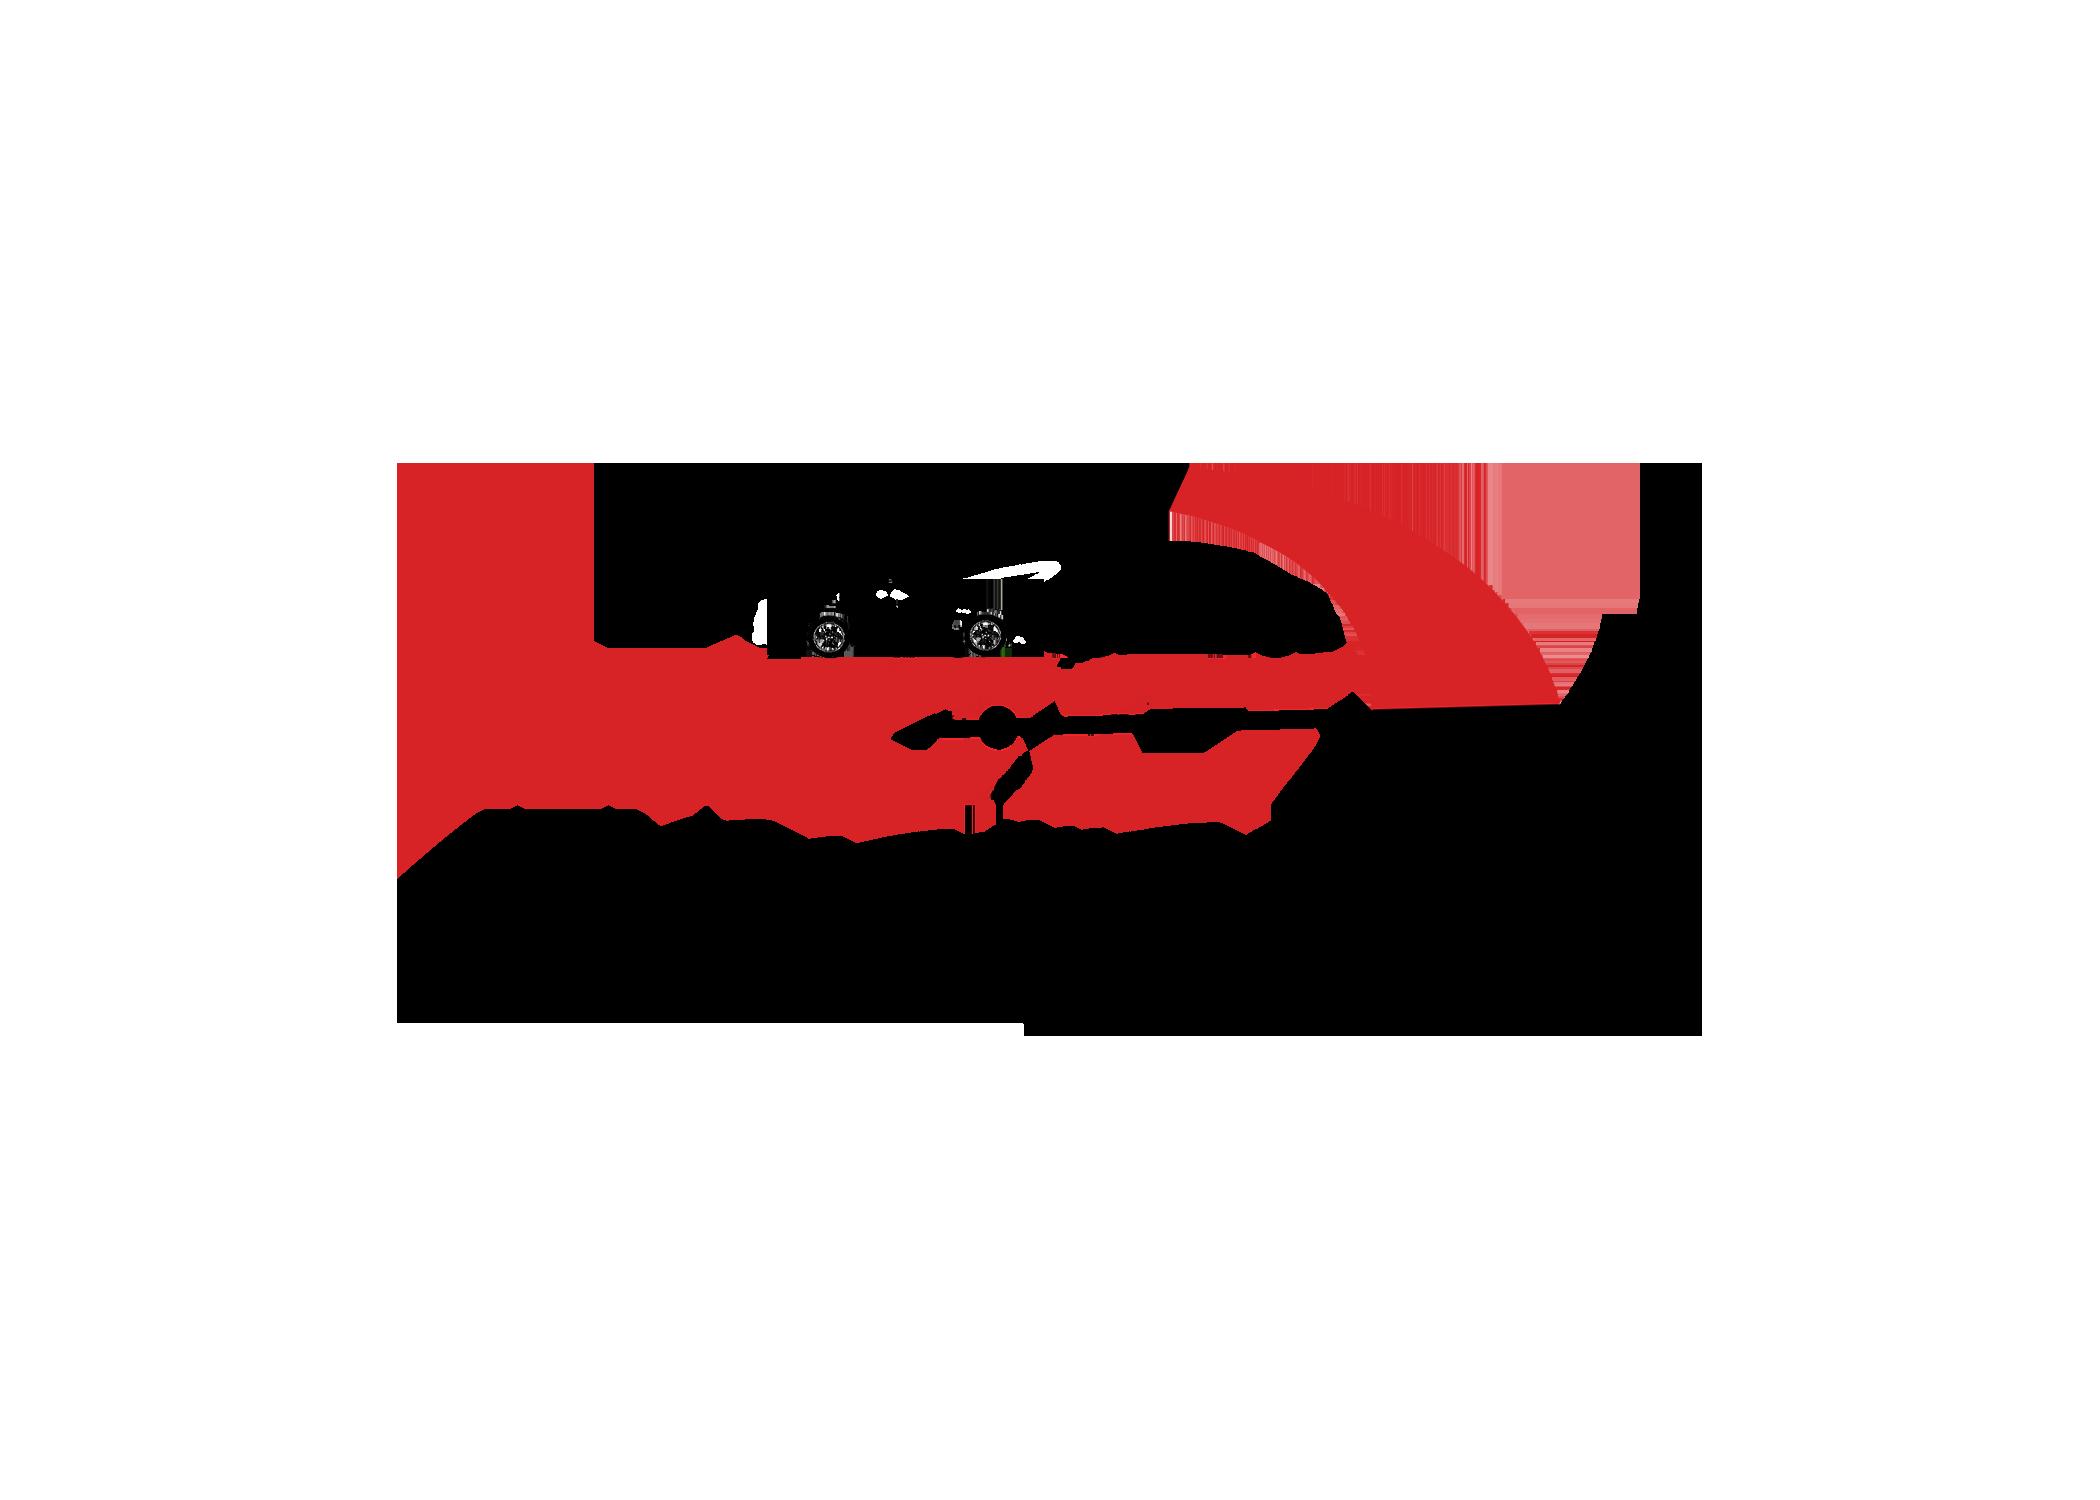 http://jameswoodracing.com/wp-content/uploads/2019/10/EVO-S15-png-Logo.png